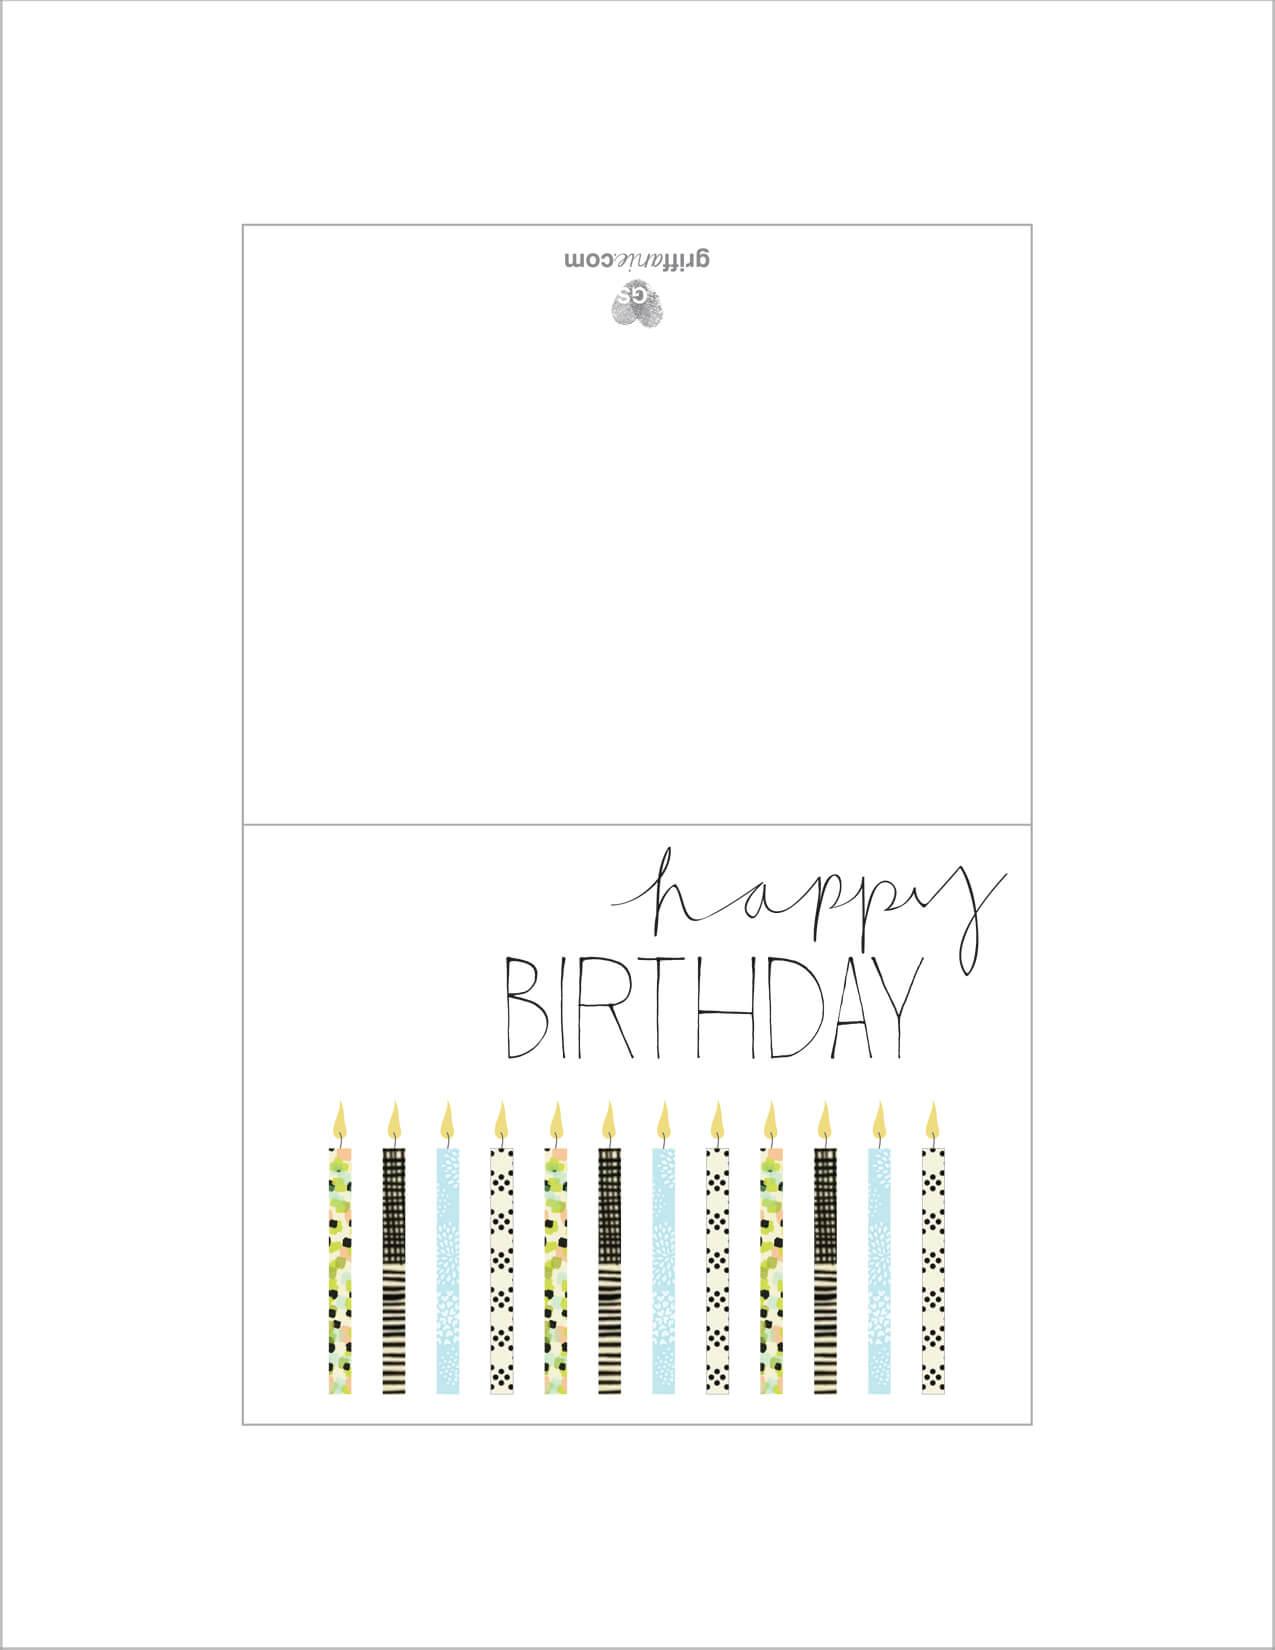 Card Folding Templates ] - Diamond Card Folding Template My With Card Folding Templates Free